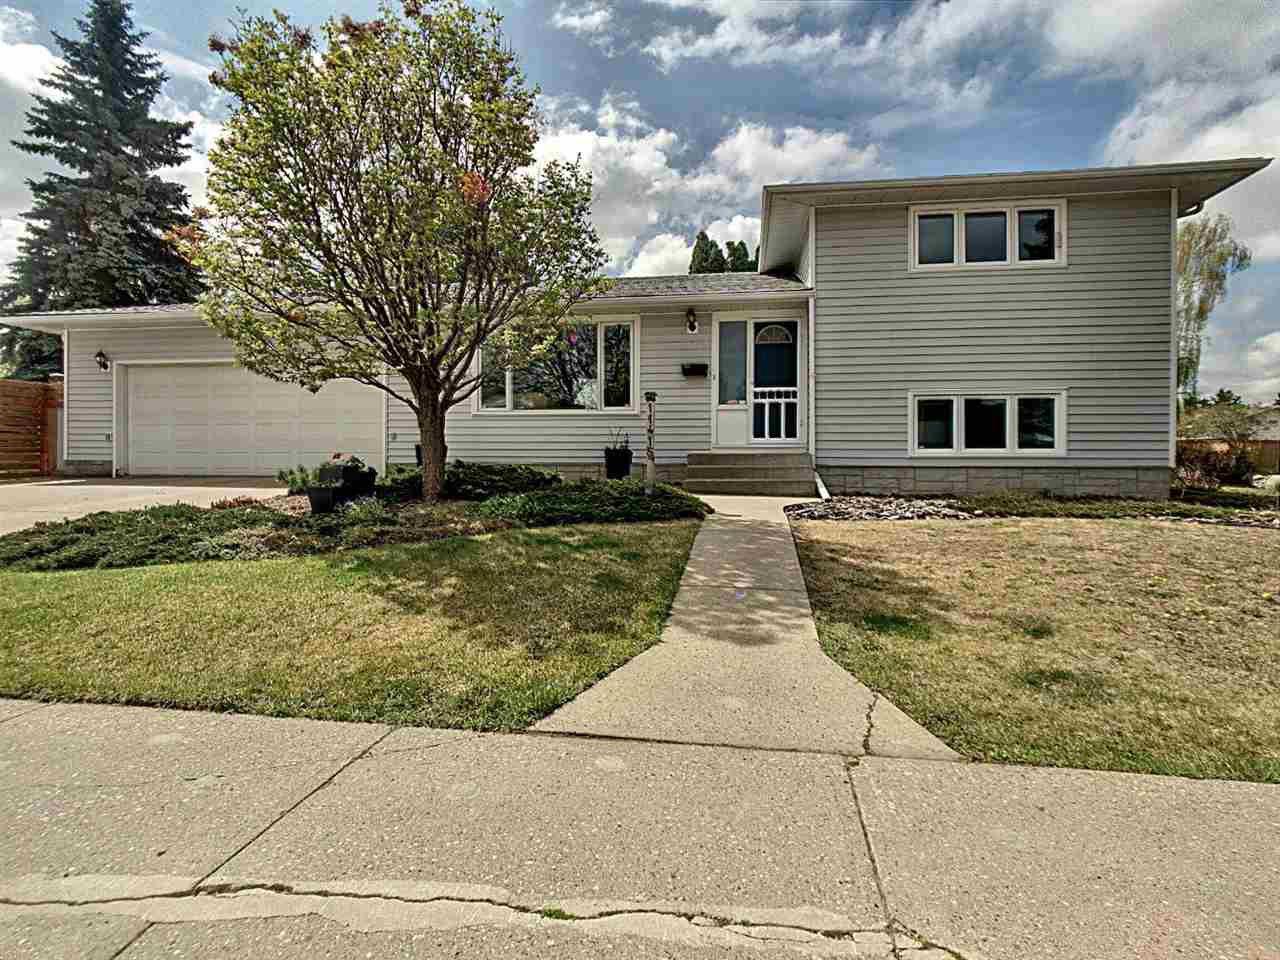 Main Photo: 11415 37 Avenue in Edmonton: Zone 16 House for sale : MLS®# E4198123